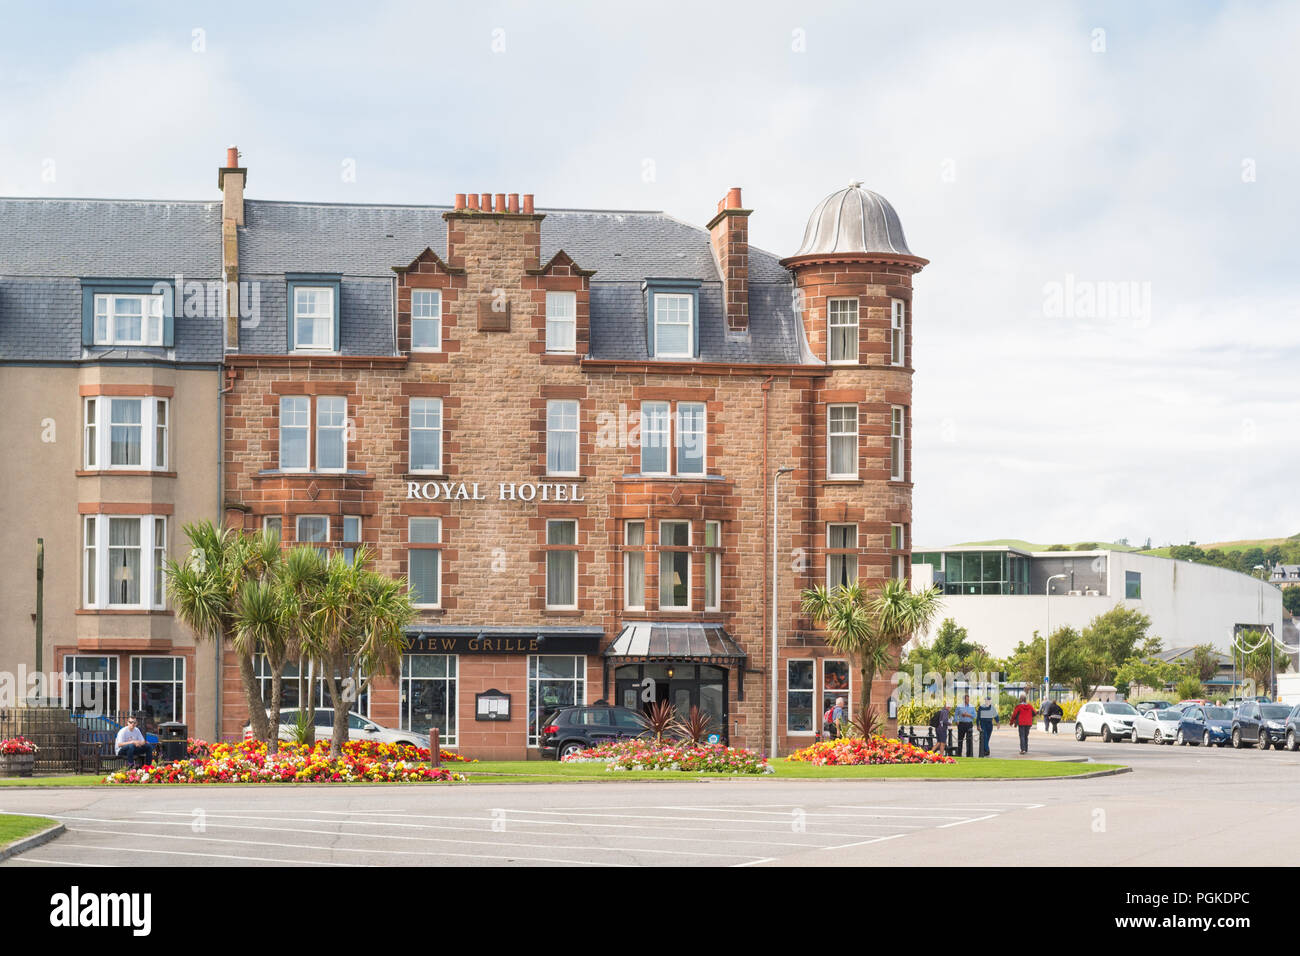 El Hotel Royal, Campbeltown, Kintyre, Argyll and Bute, en Escocia, Reino Unido Imagen De Stock